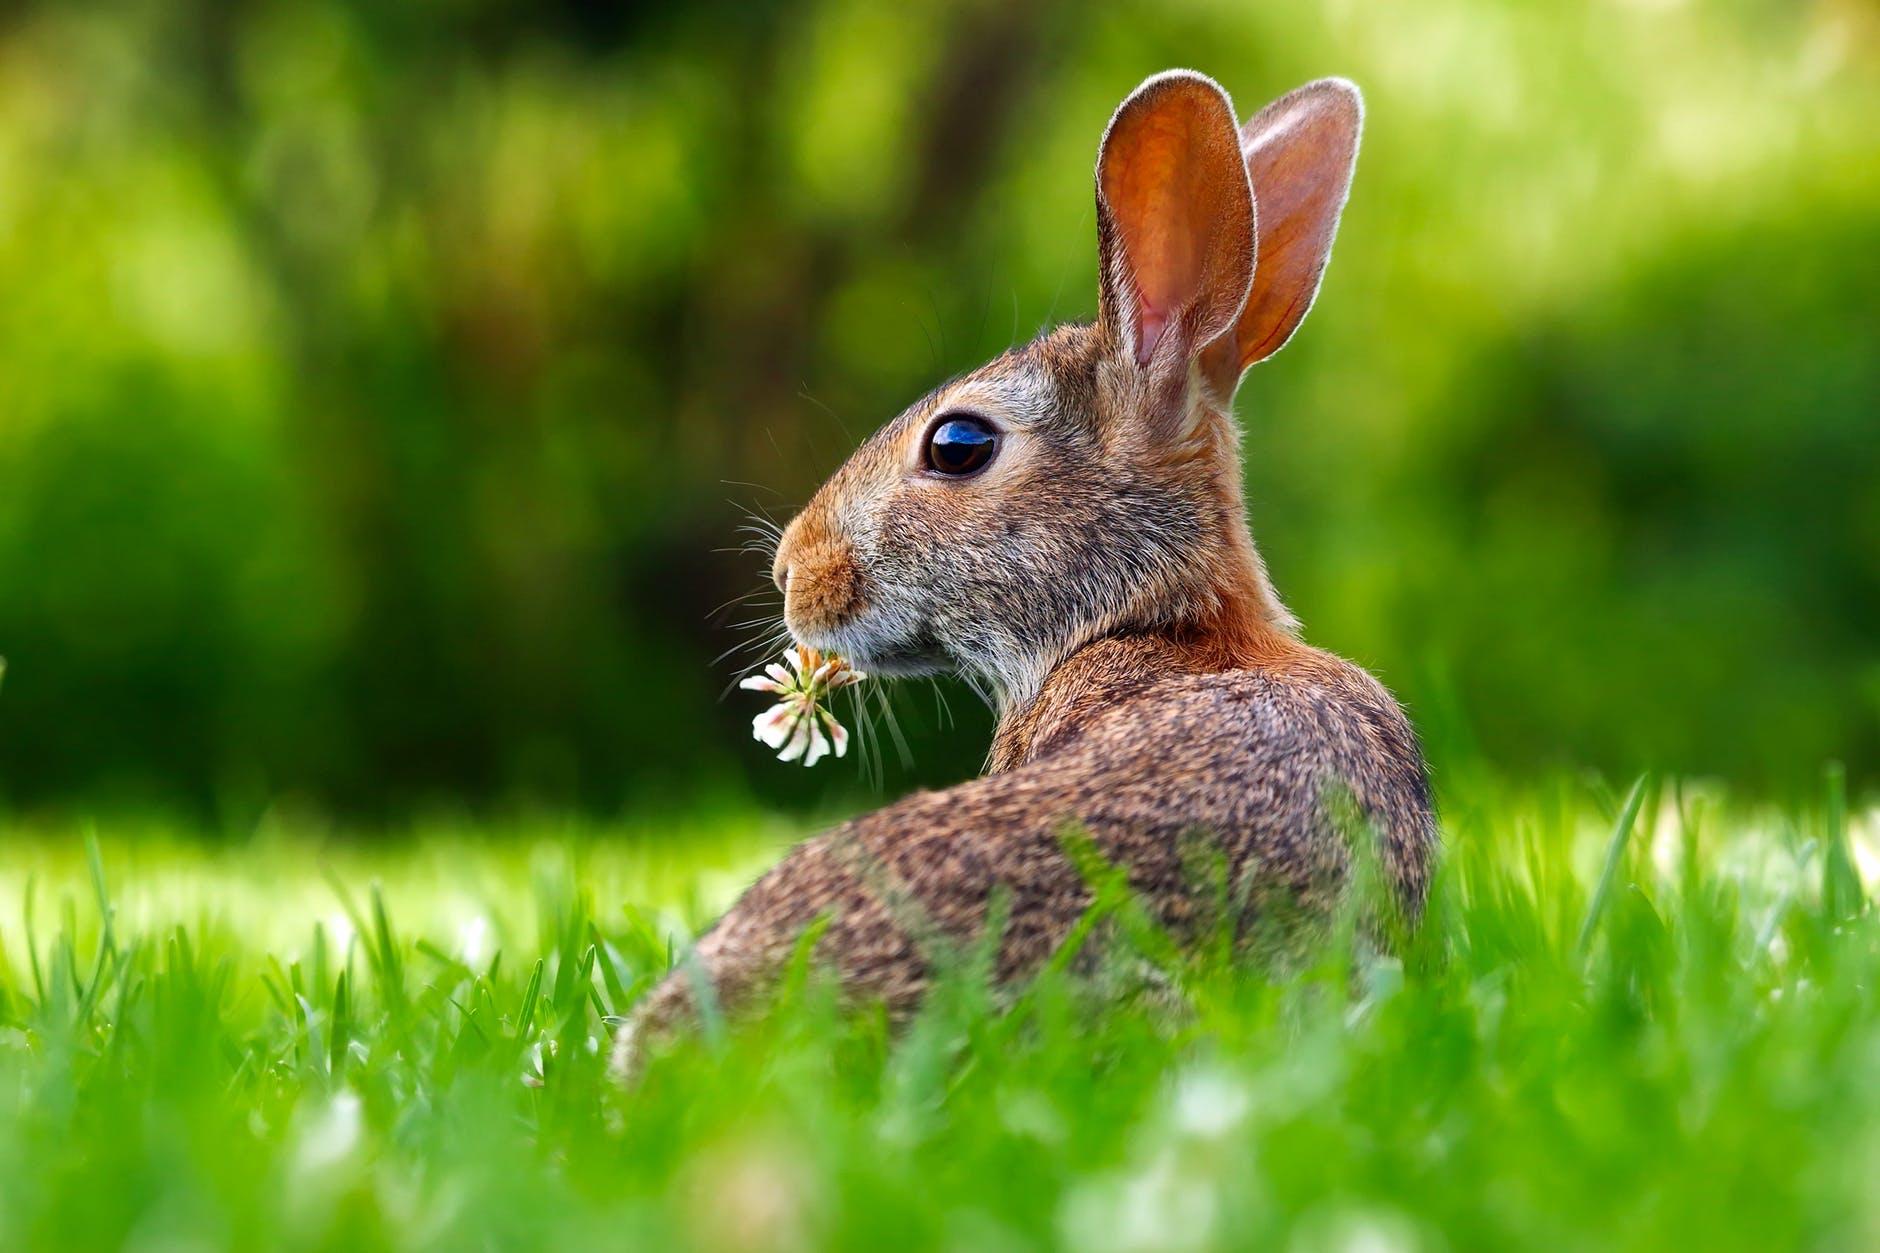 close up of an animal eating grass